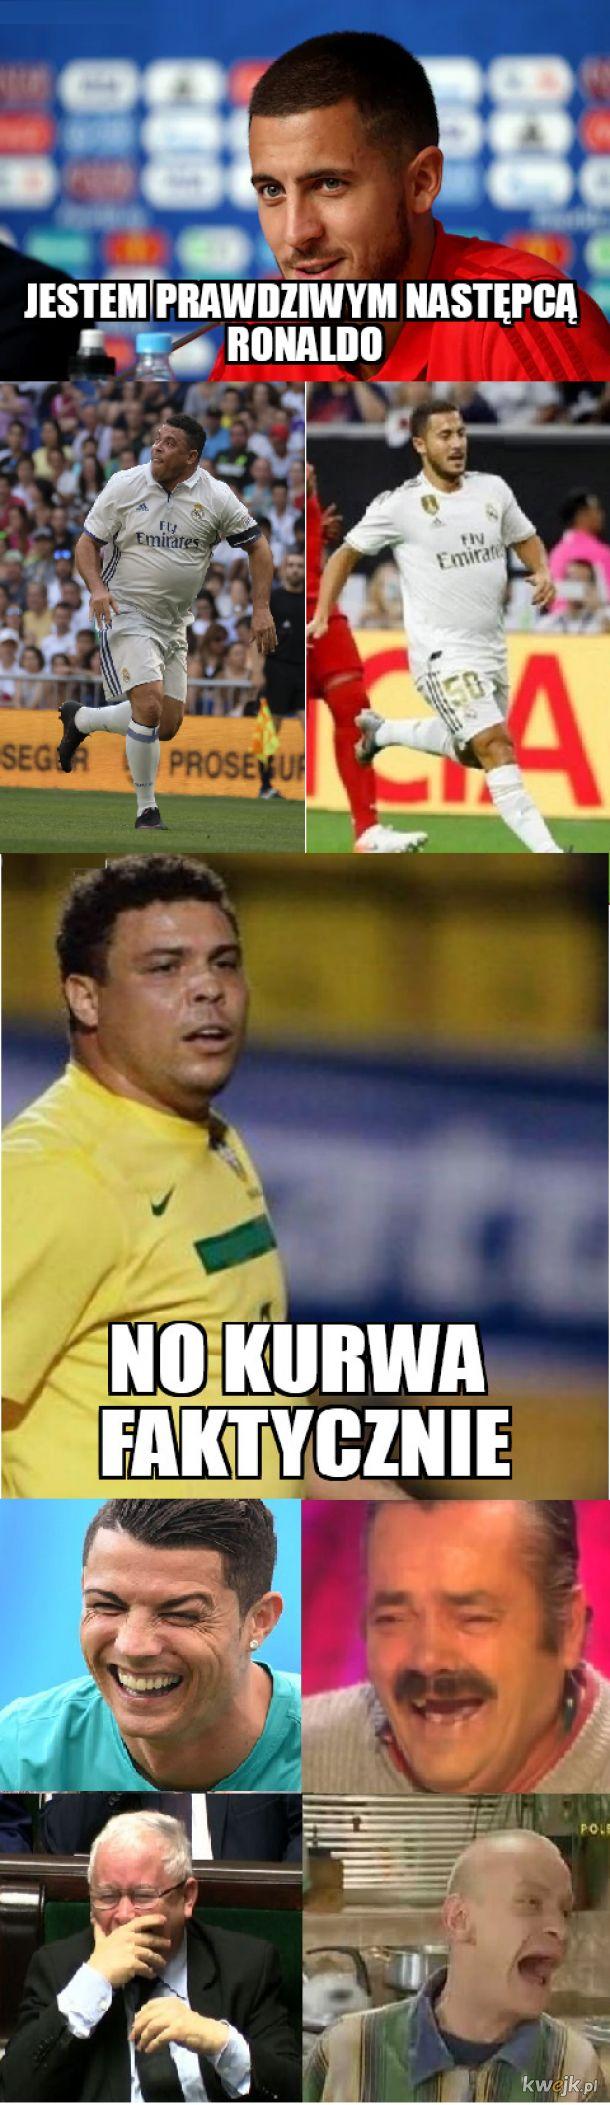 Następca Ronaldo